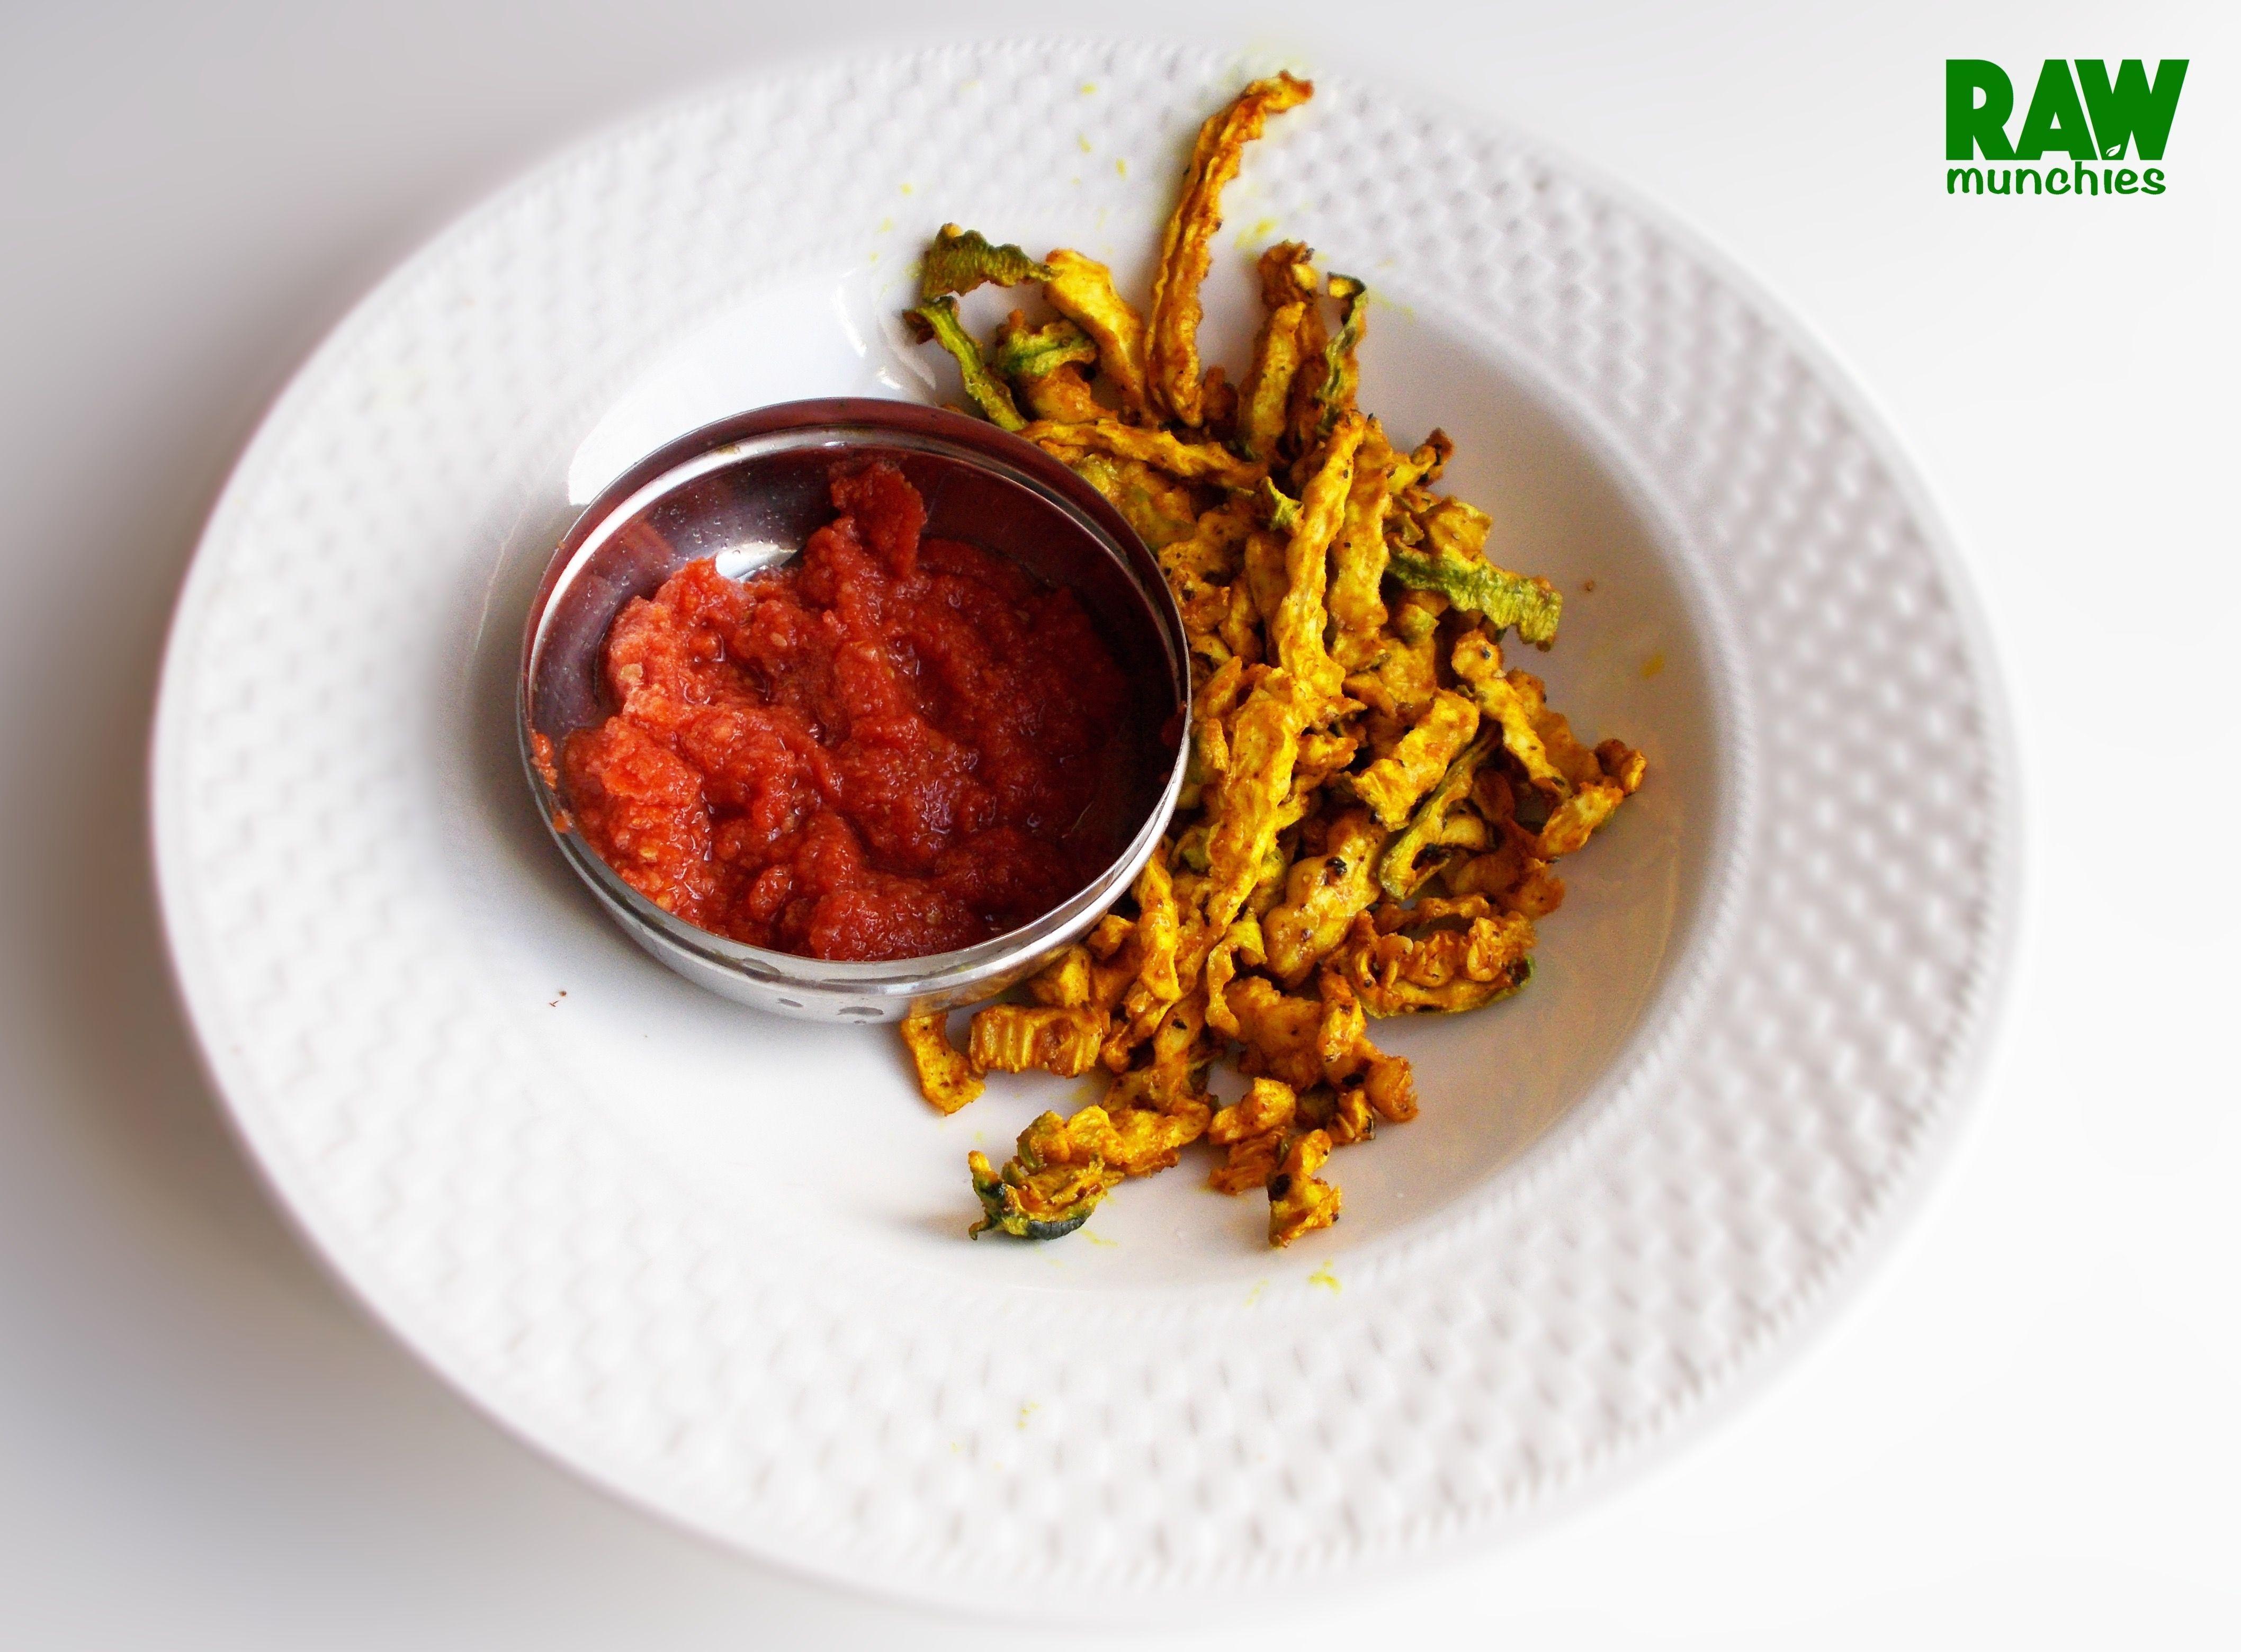 Raw Vegan ketchup | Rawmunchies.org | Raw Vegan Recipes #RECIPE: http://ift.tt/2eF8NVM #Raw #vegan #rawvegan #glutenfree